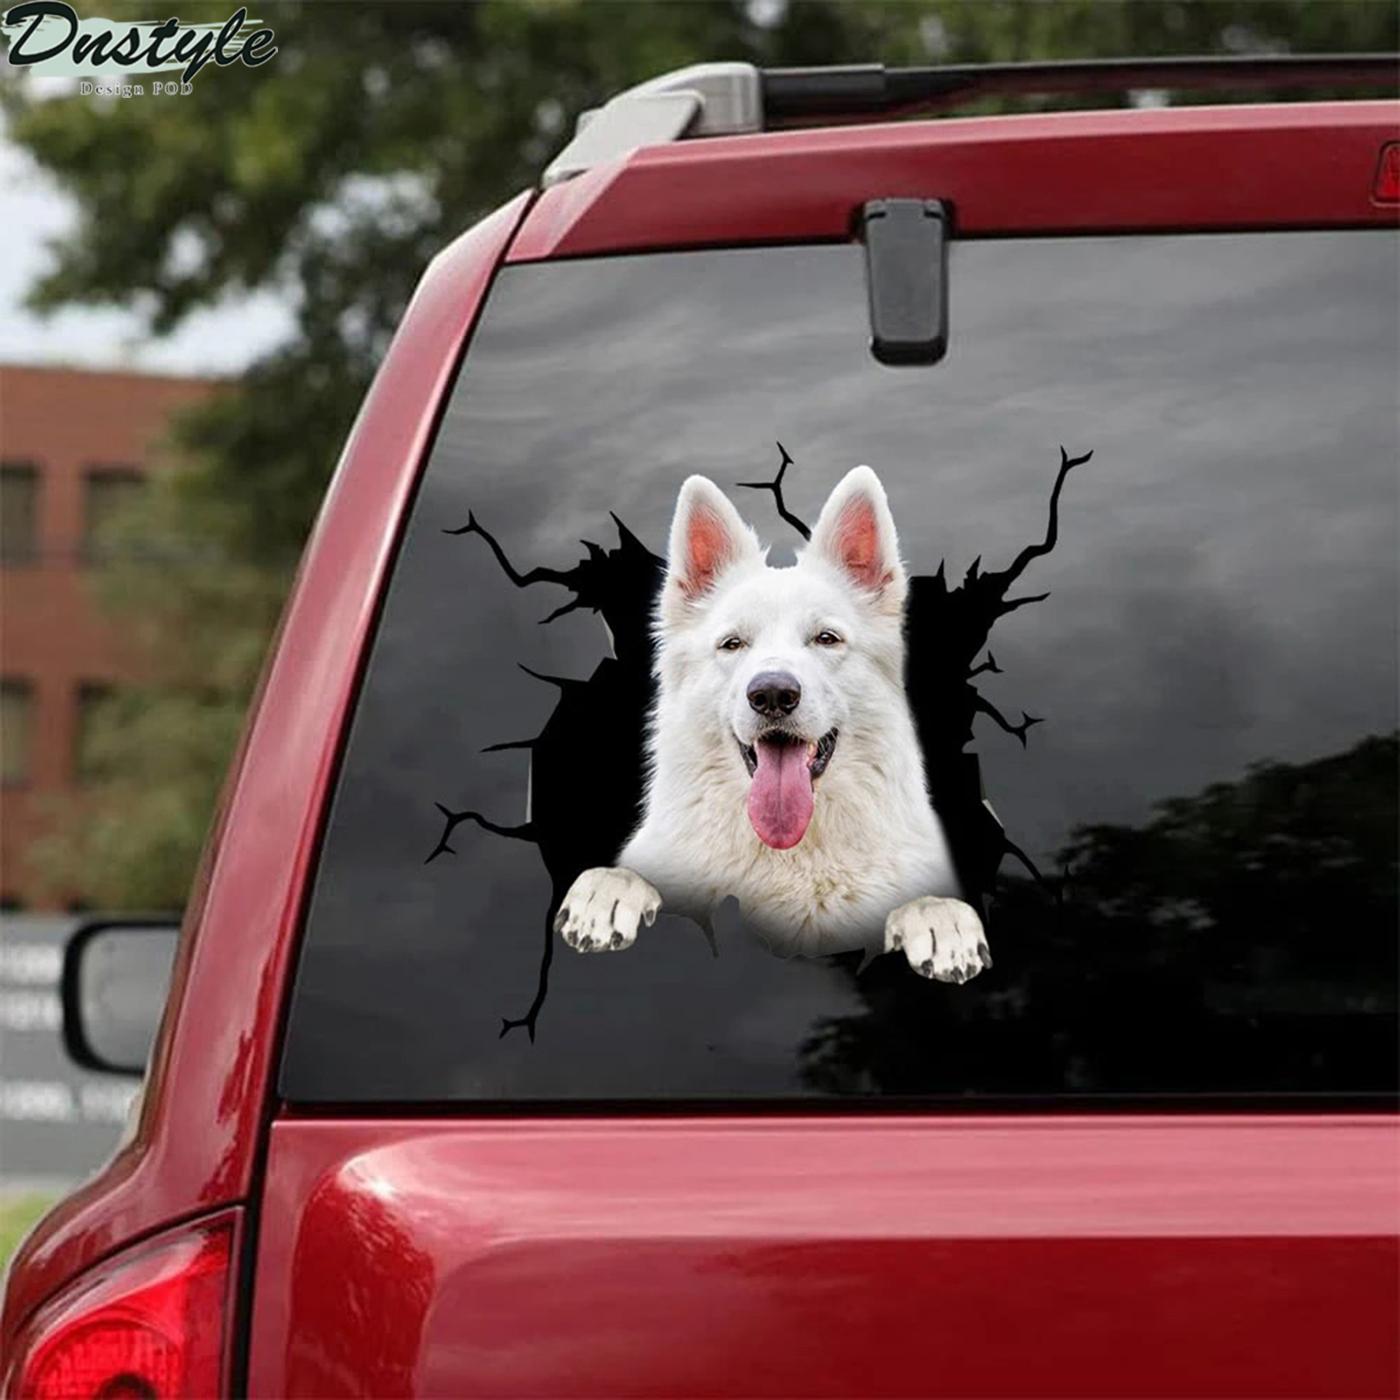 German shepherd white crack car decal sticker 2